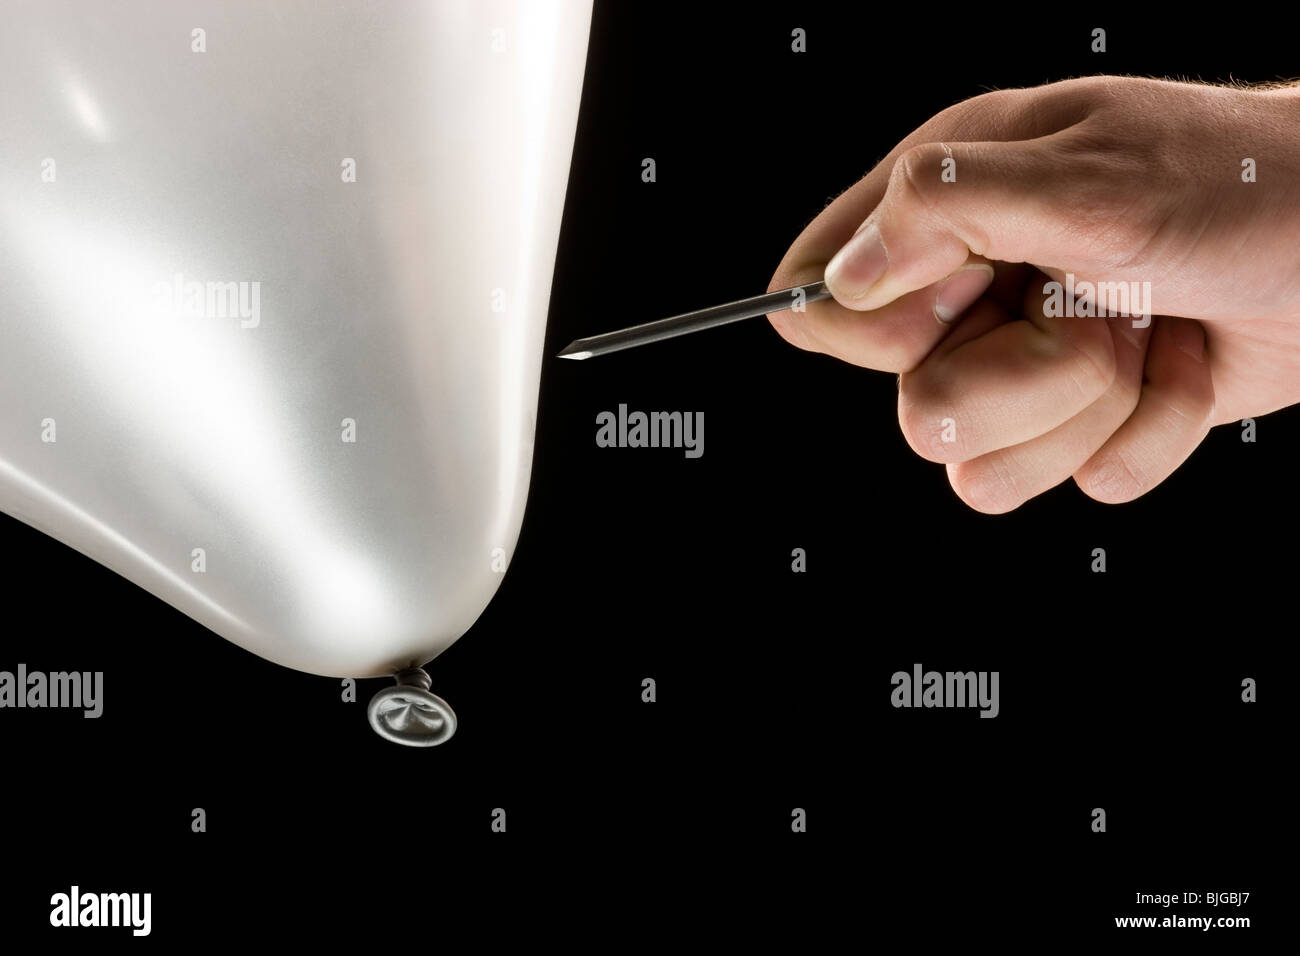 Popping balloon - Stock Image